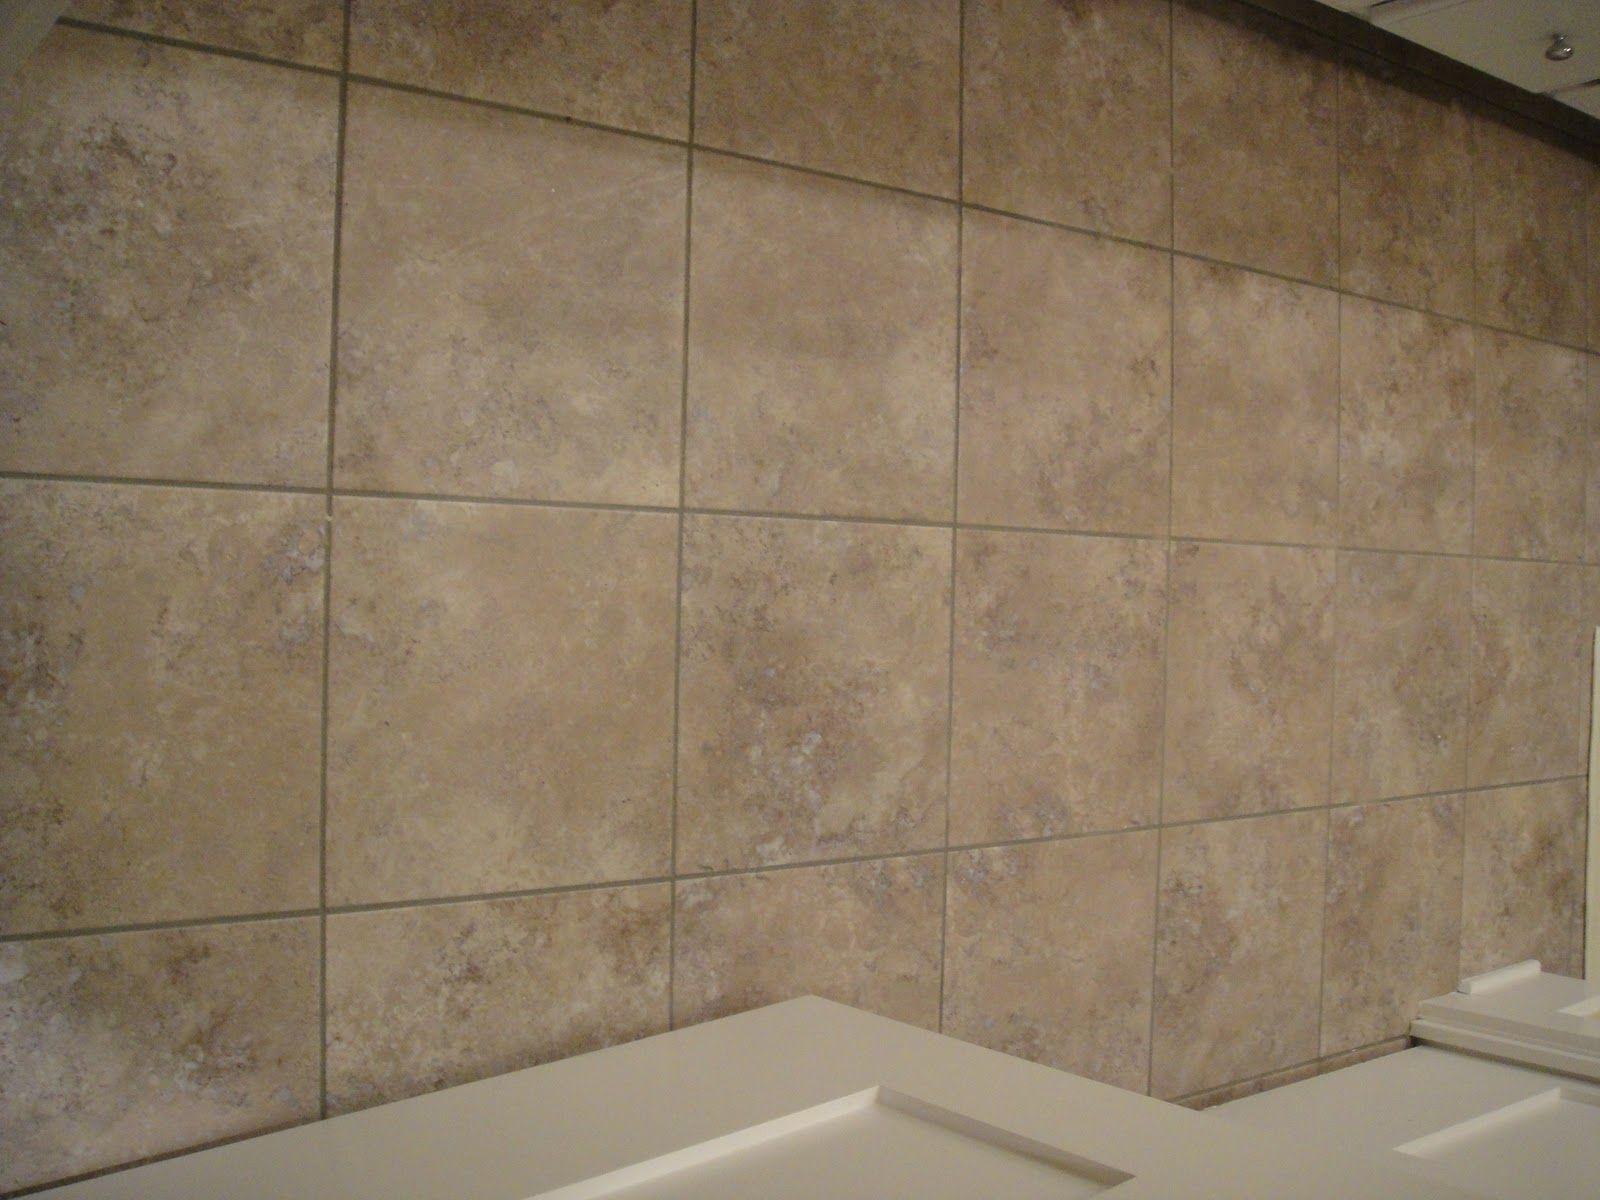 tile linoleum flooring Linoleum flooring, Floor